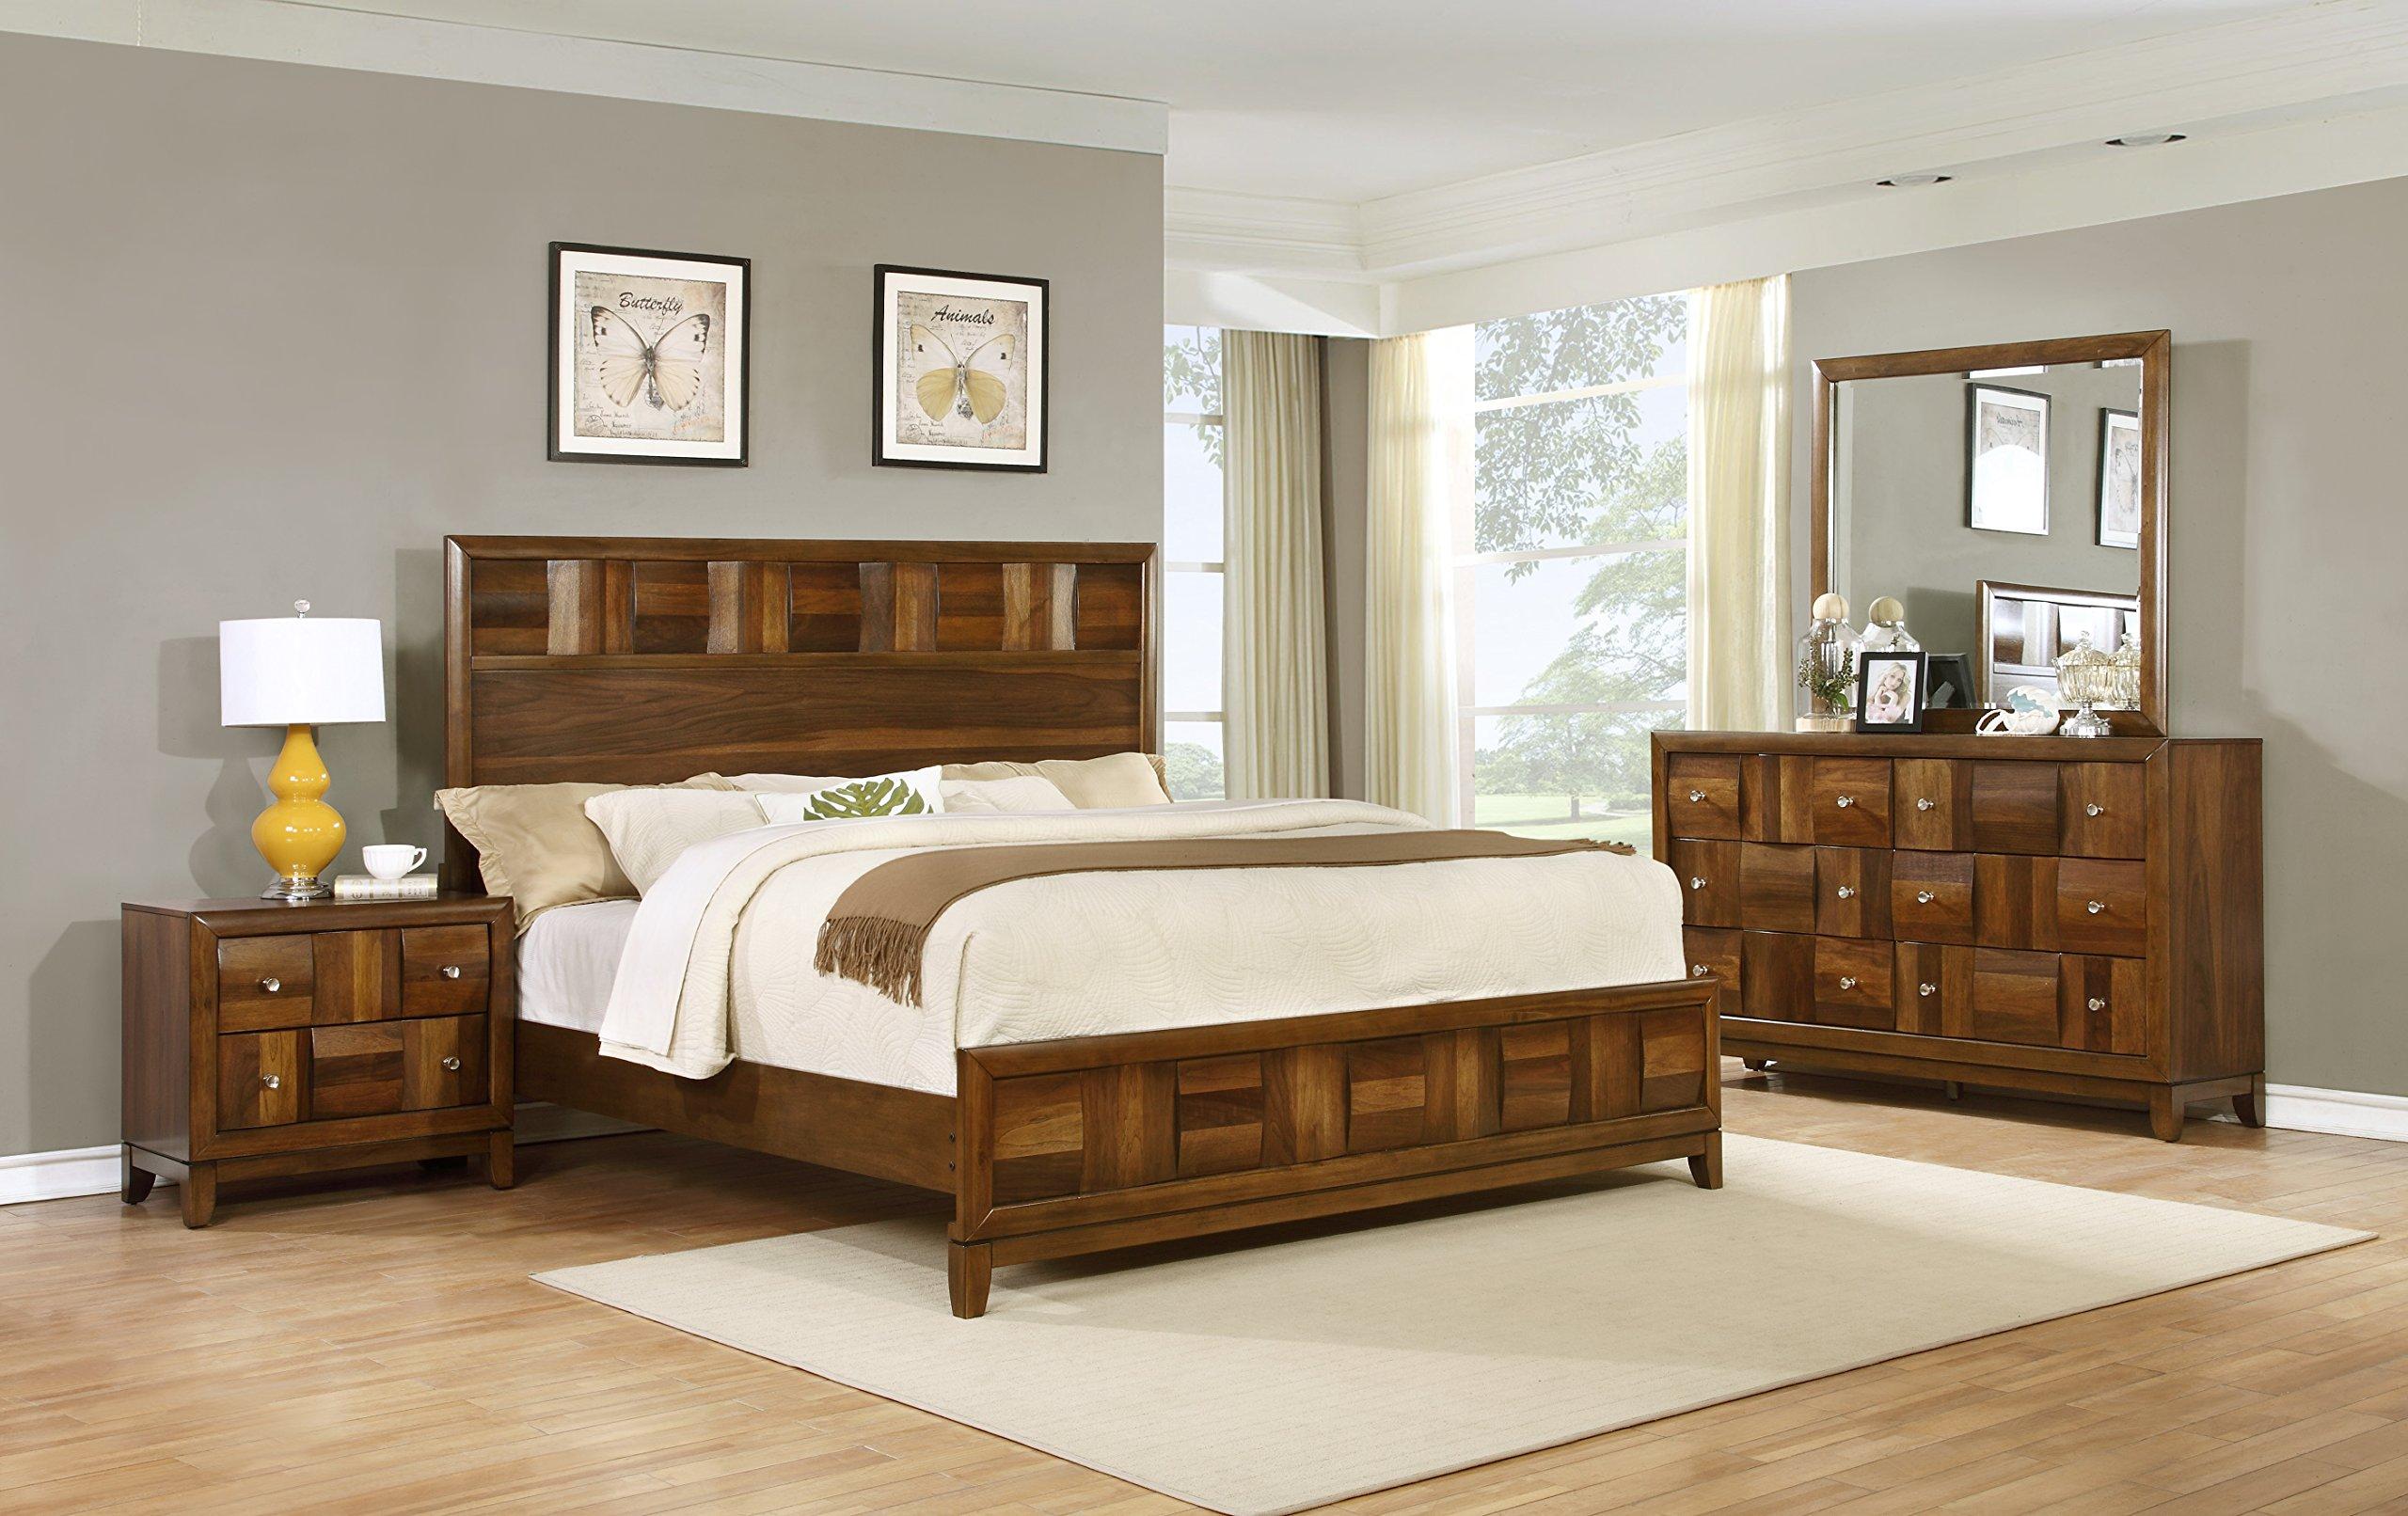 Buy New Chinese bedroom furniture, solid wood furniture, 1.8 meter ...